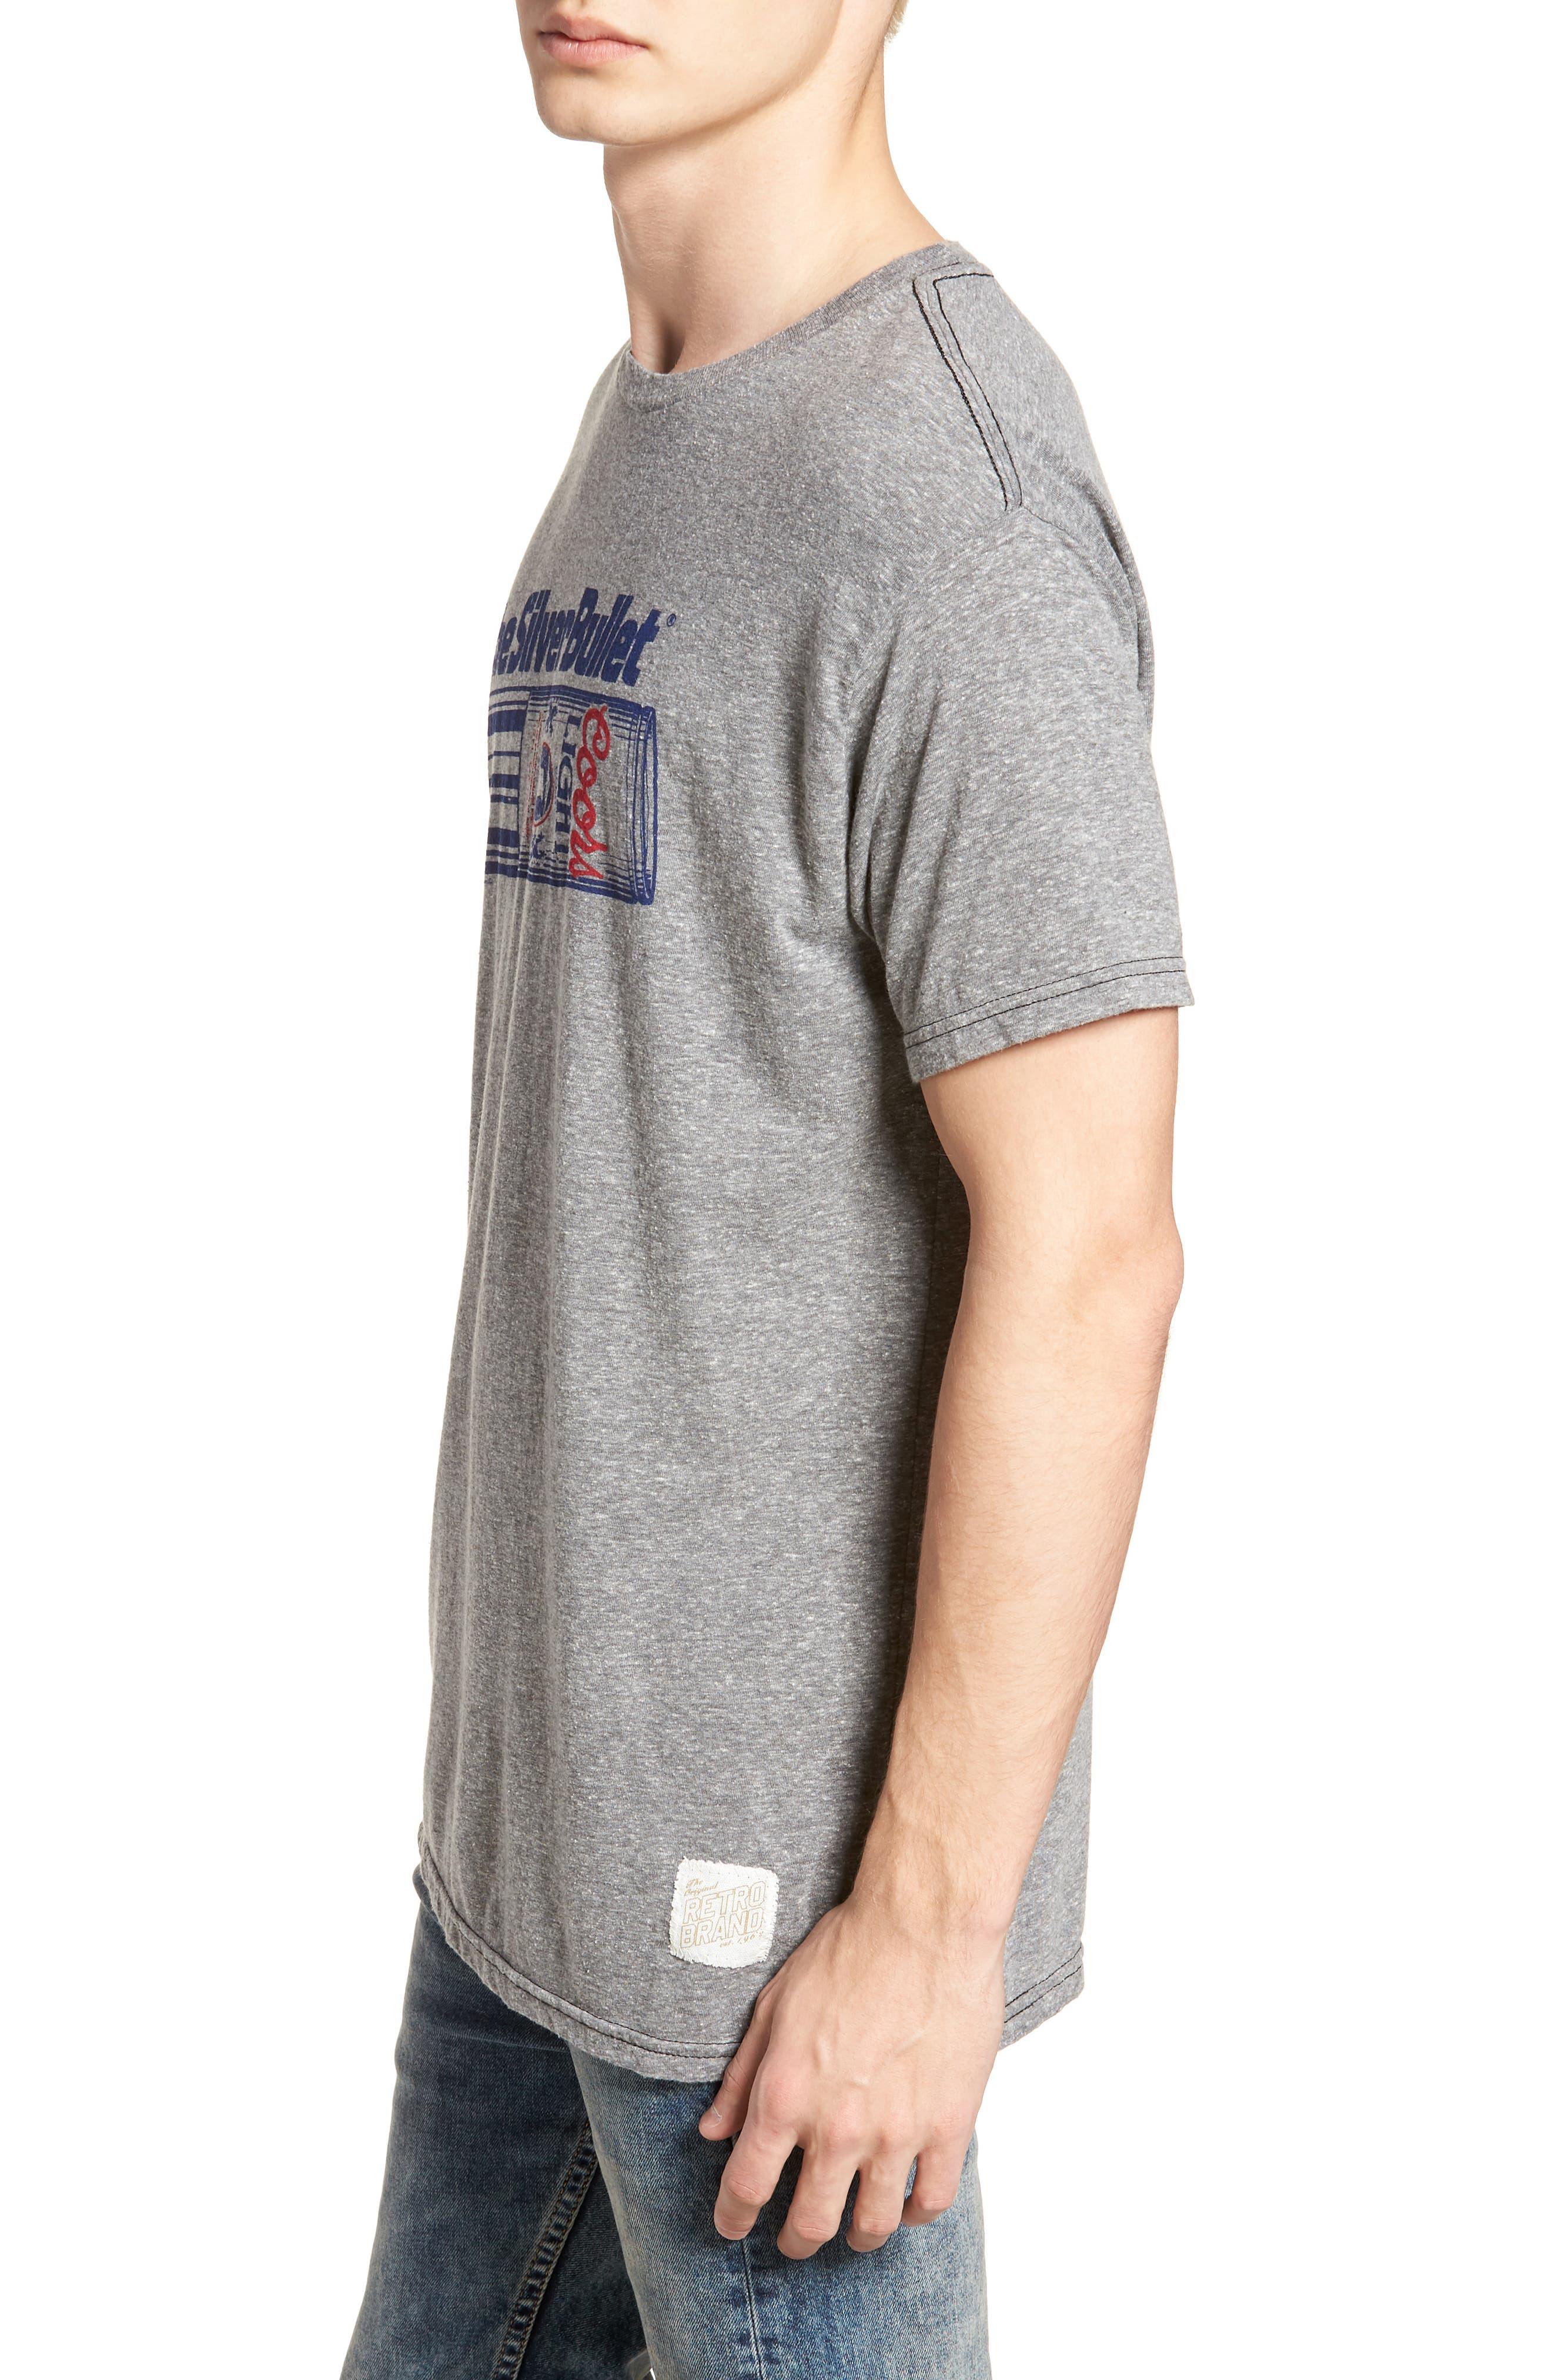 RETRO BRAND,                             Original Retro Brand Silver Bullet Graphic T-Shirt,                             Alternate thumbnail 3, color,                             020